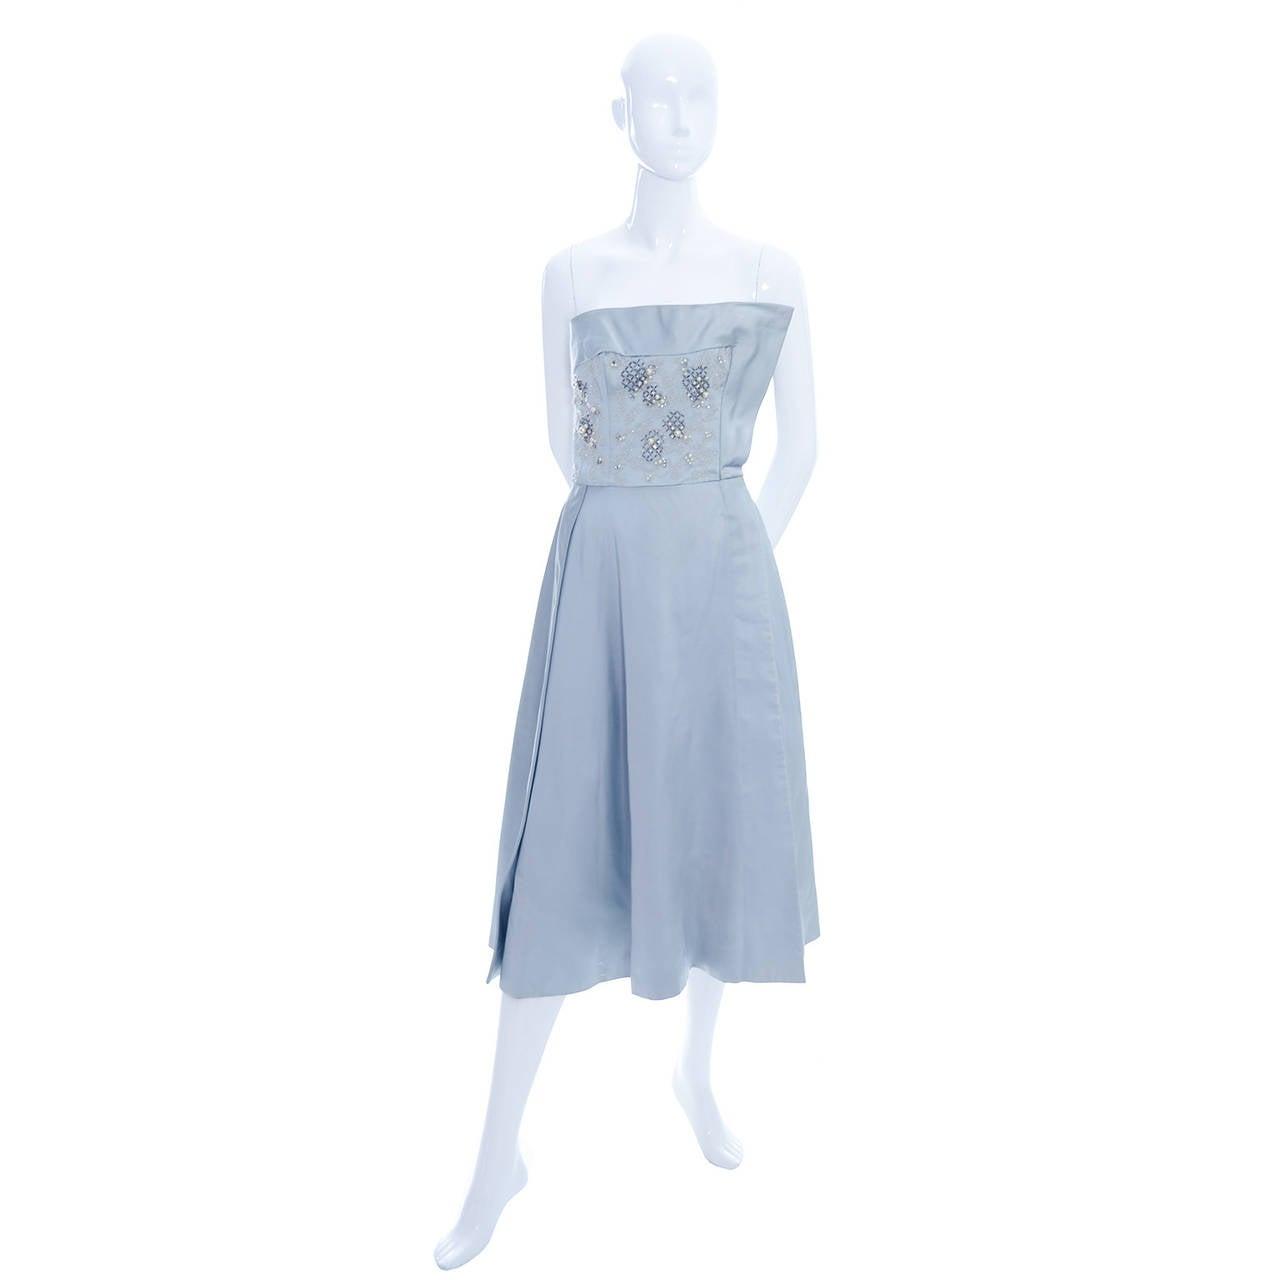 1950s Harvey Berin Karen Stark Vintage Dress in Blue Satin Beaded W Rhinestones In Excellent Condition For Sale In Portland, OR